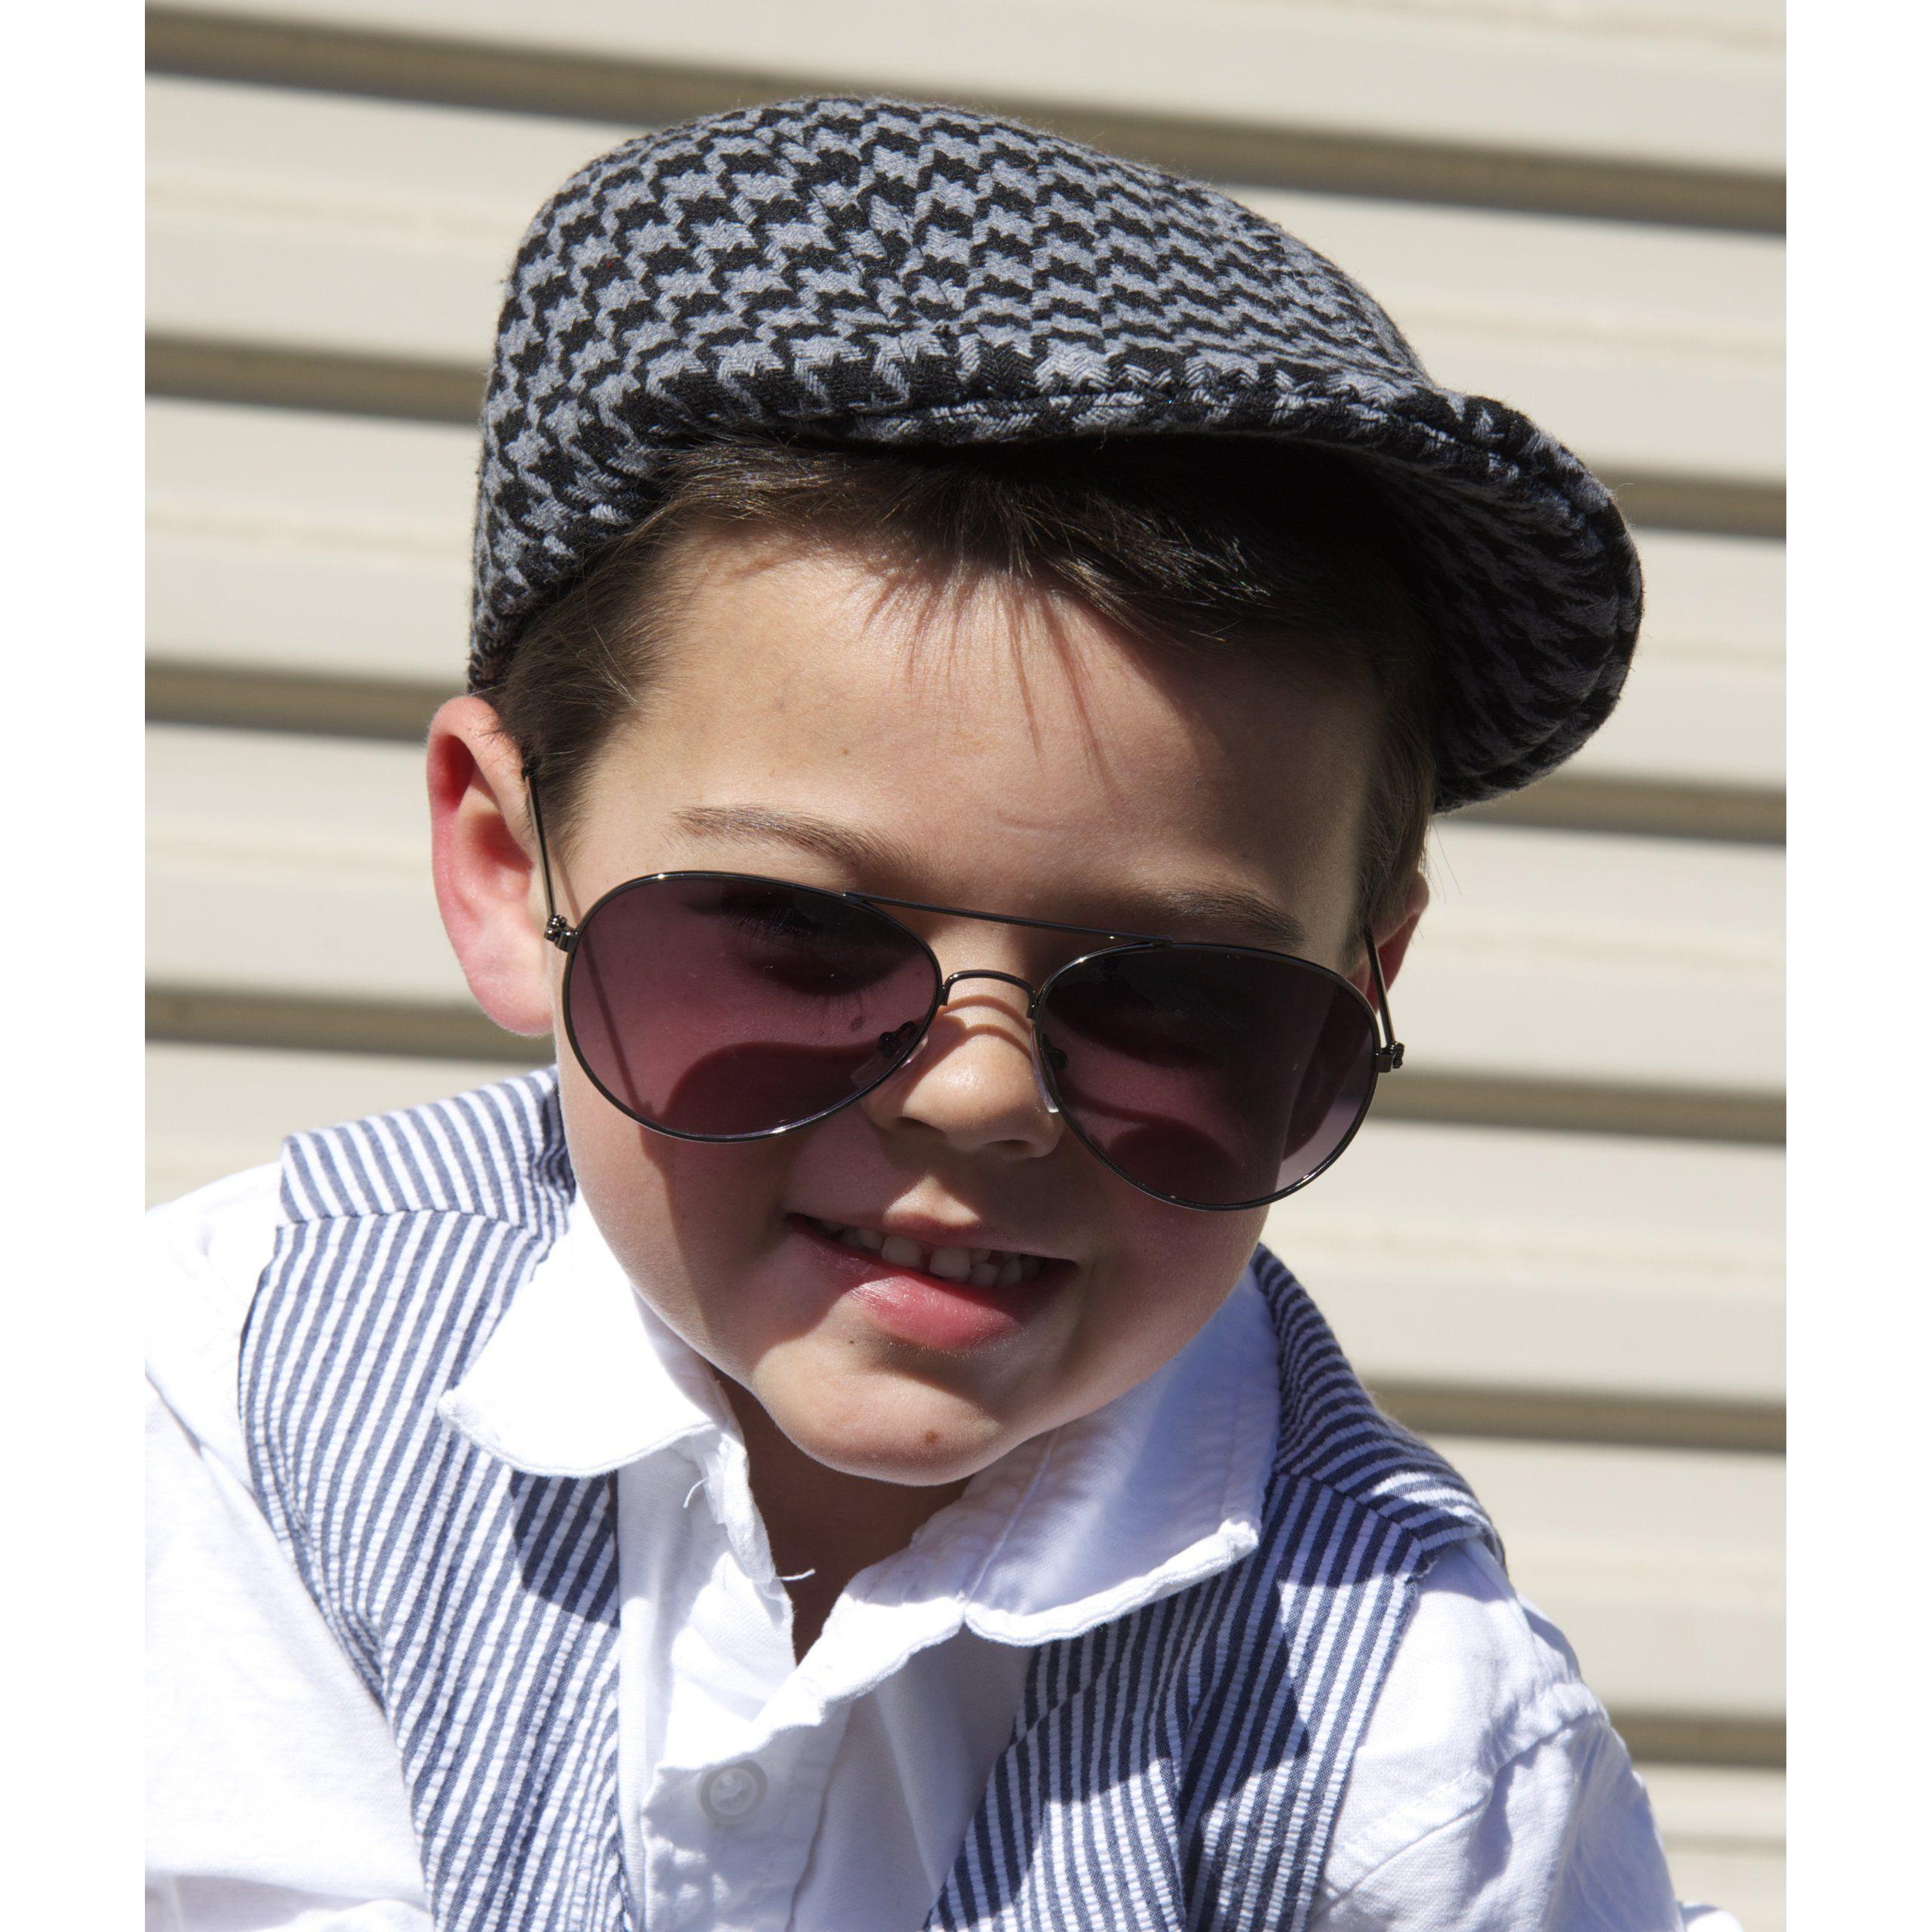 Loving this Newsboy Cap for Boys!